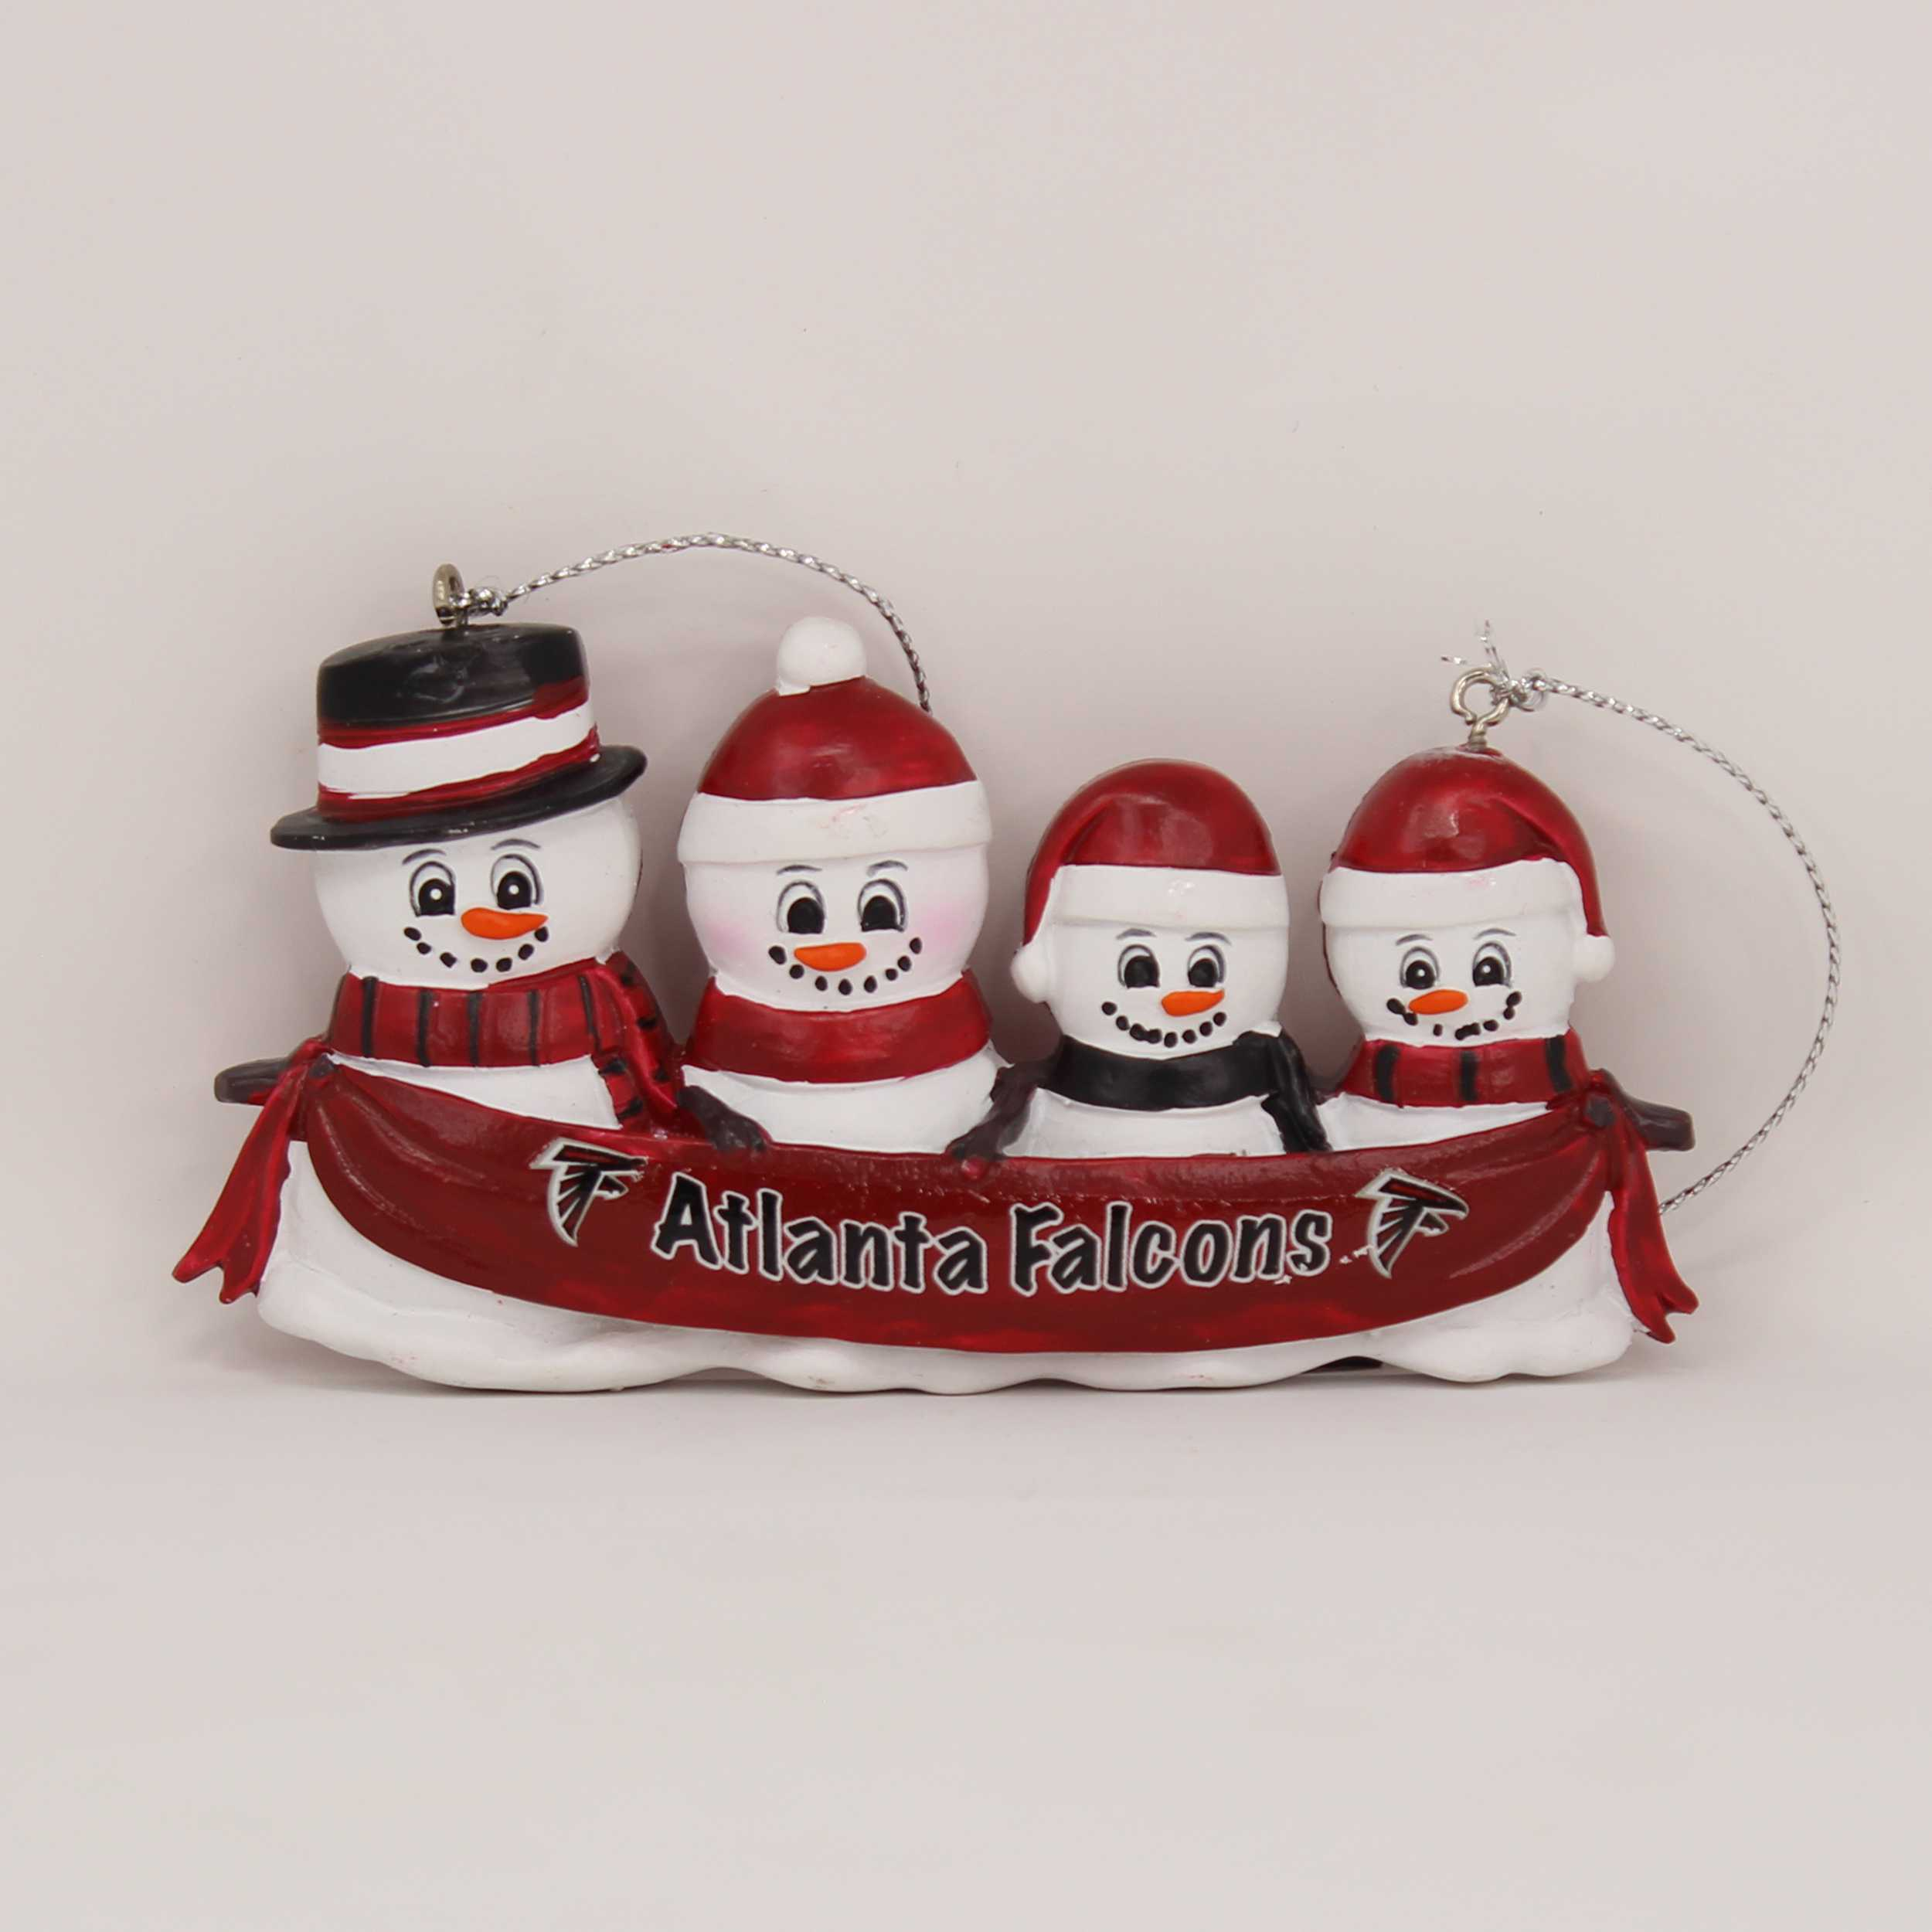 Personalized Family Ornament Atlanta Falcons